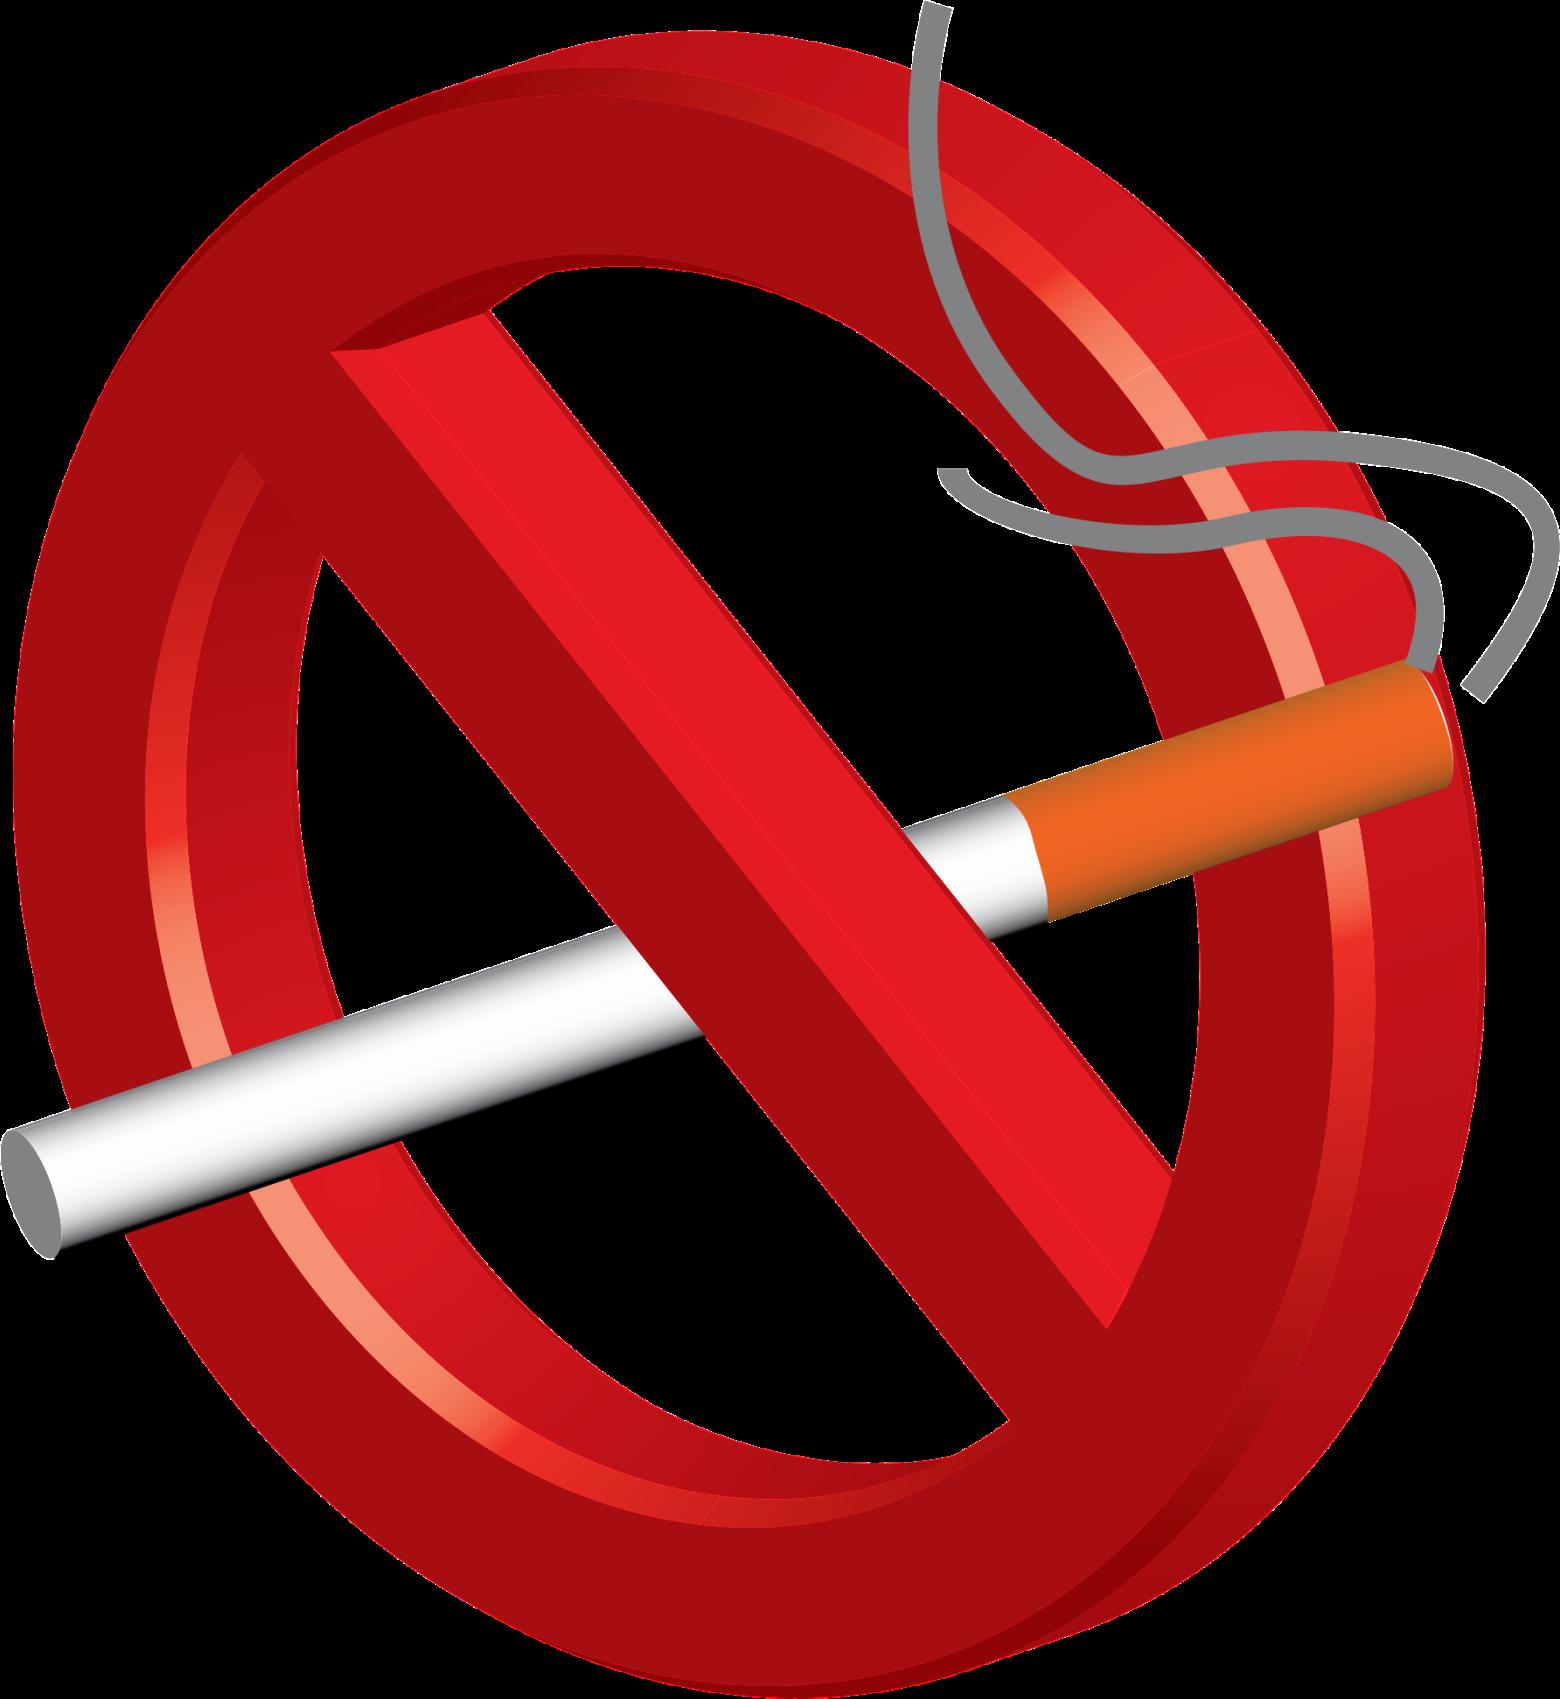 Clipart defense de fumer.